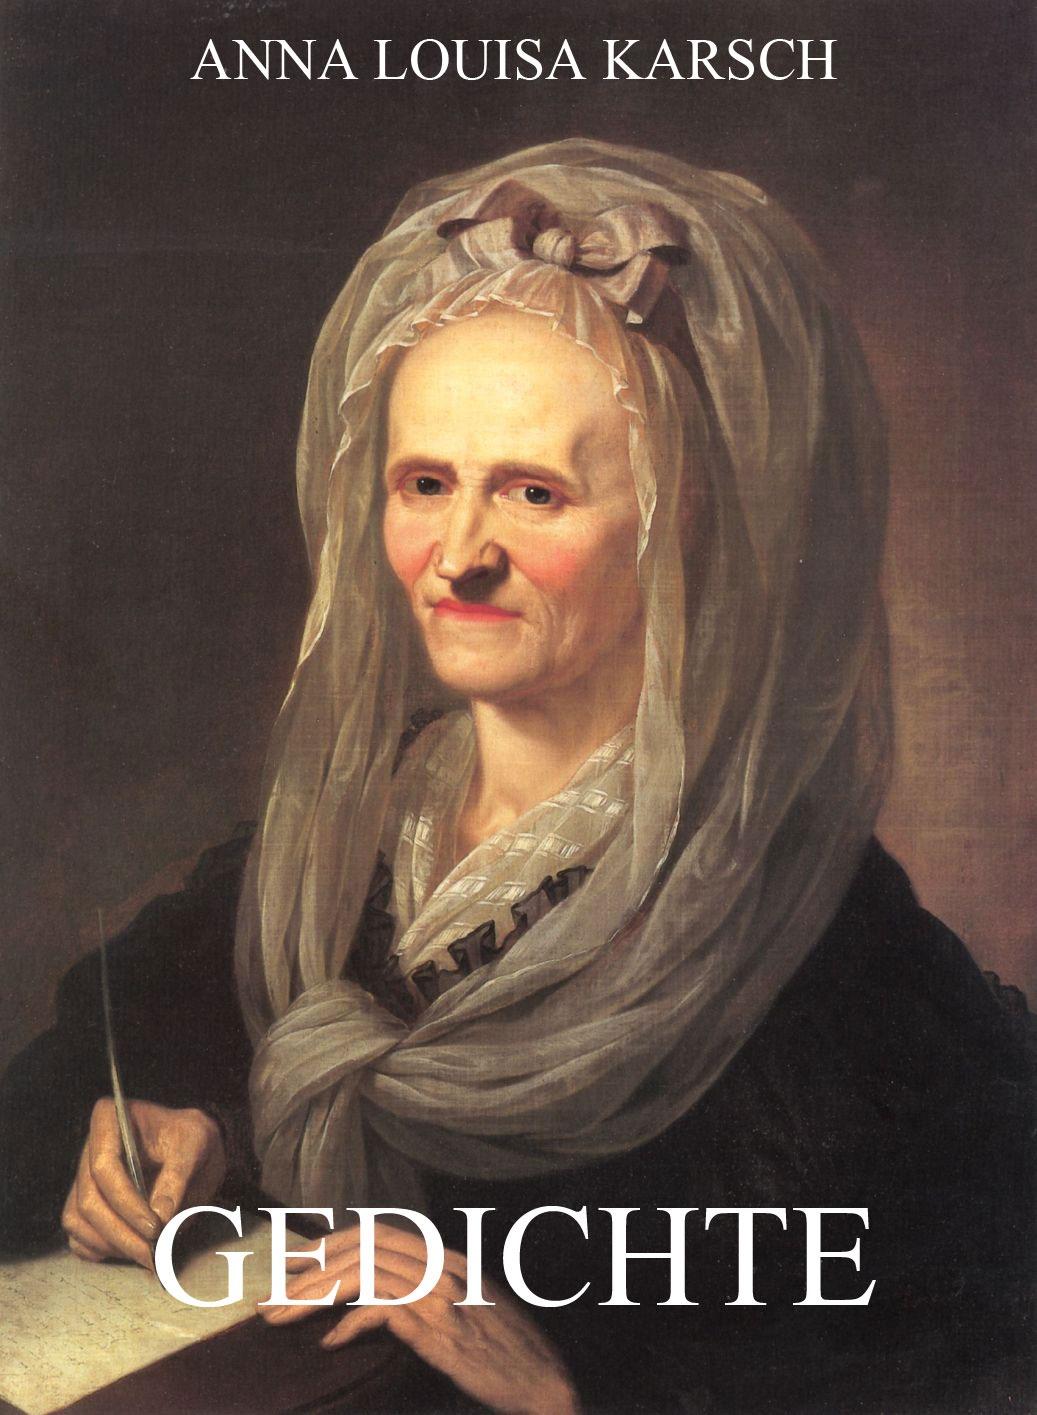 Anna Louisa Karsch Gedichte louisa